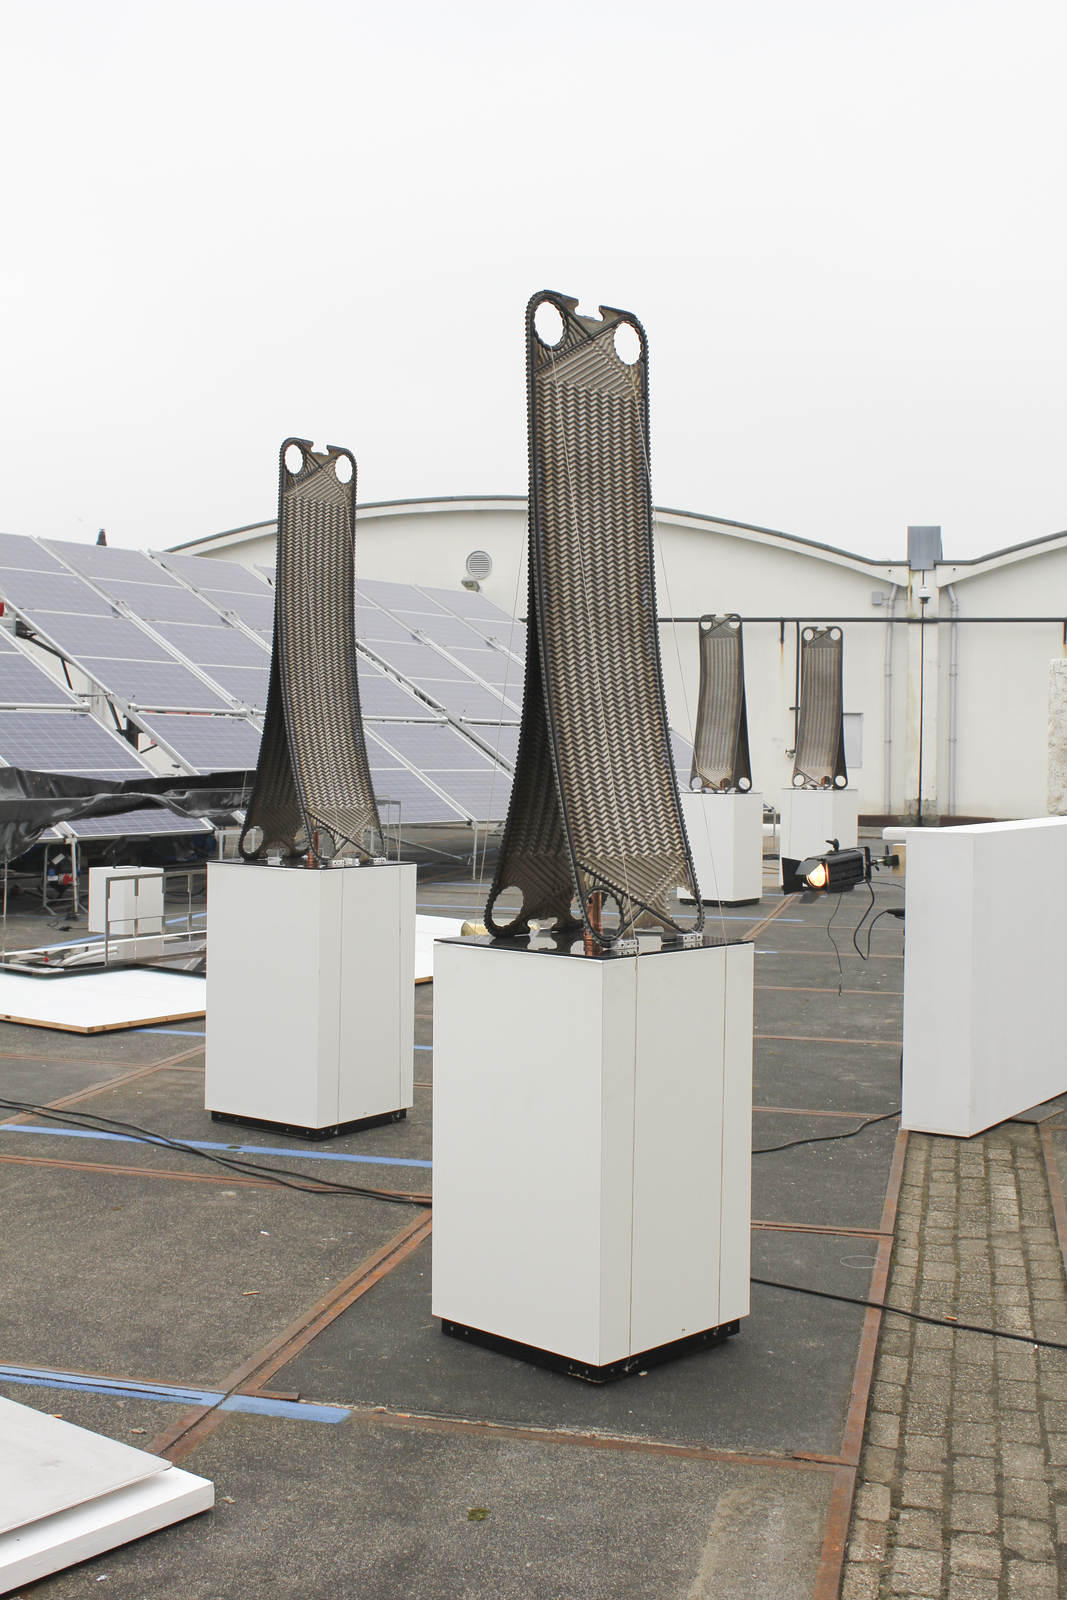 David Jablonowski at Art Rotterdam, Open Air 02